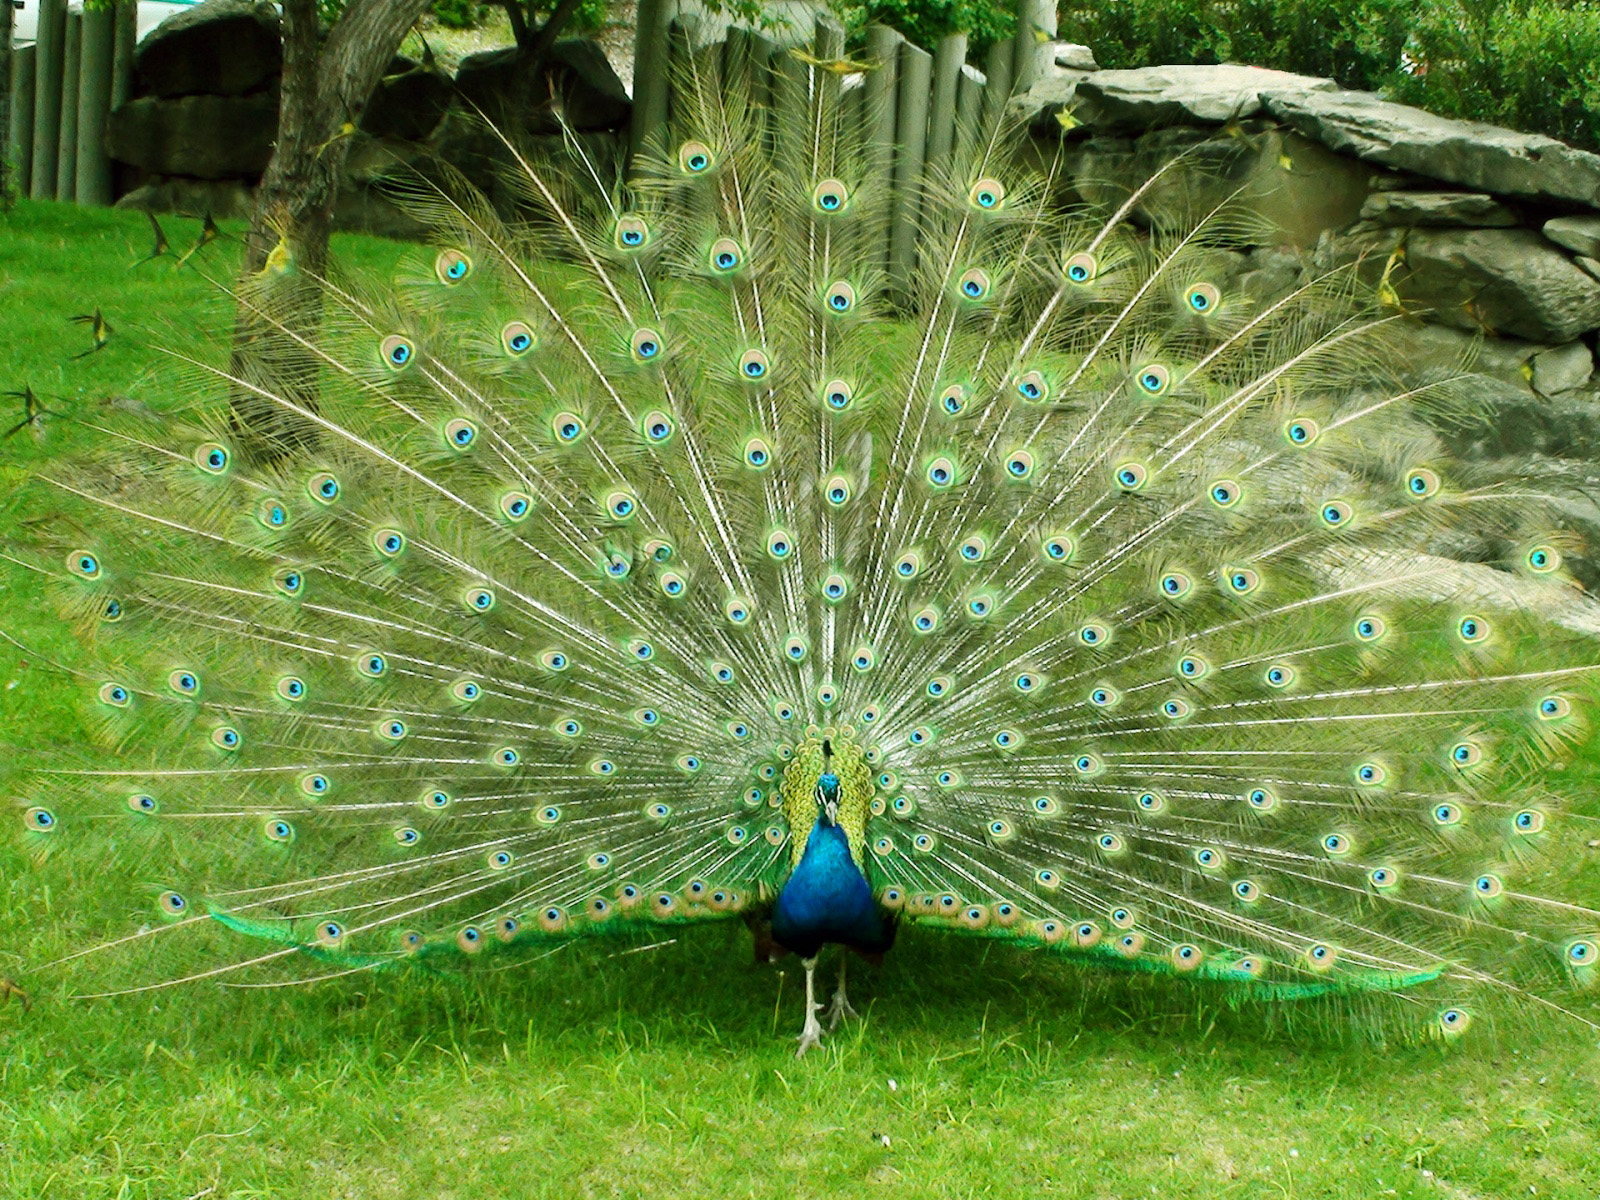 http://4.bp.blogspot.com/-rmzkyiEj2iI/UVMocanmnQI/AAAAAAAAMic/OhJHw7Q3lmg/s1600/beautiful+peacockwallpapers+hd.jpg